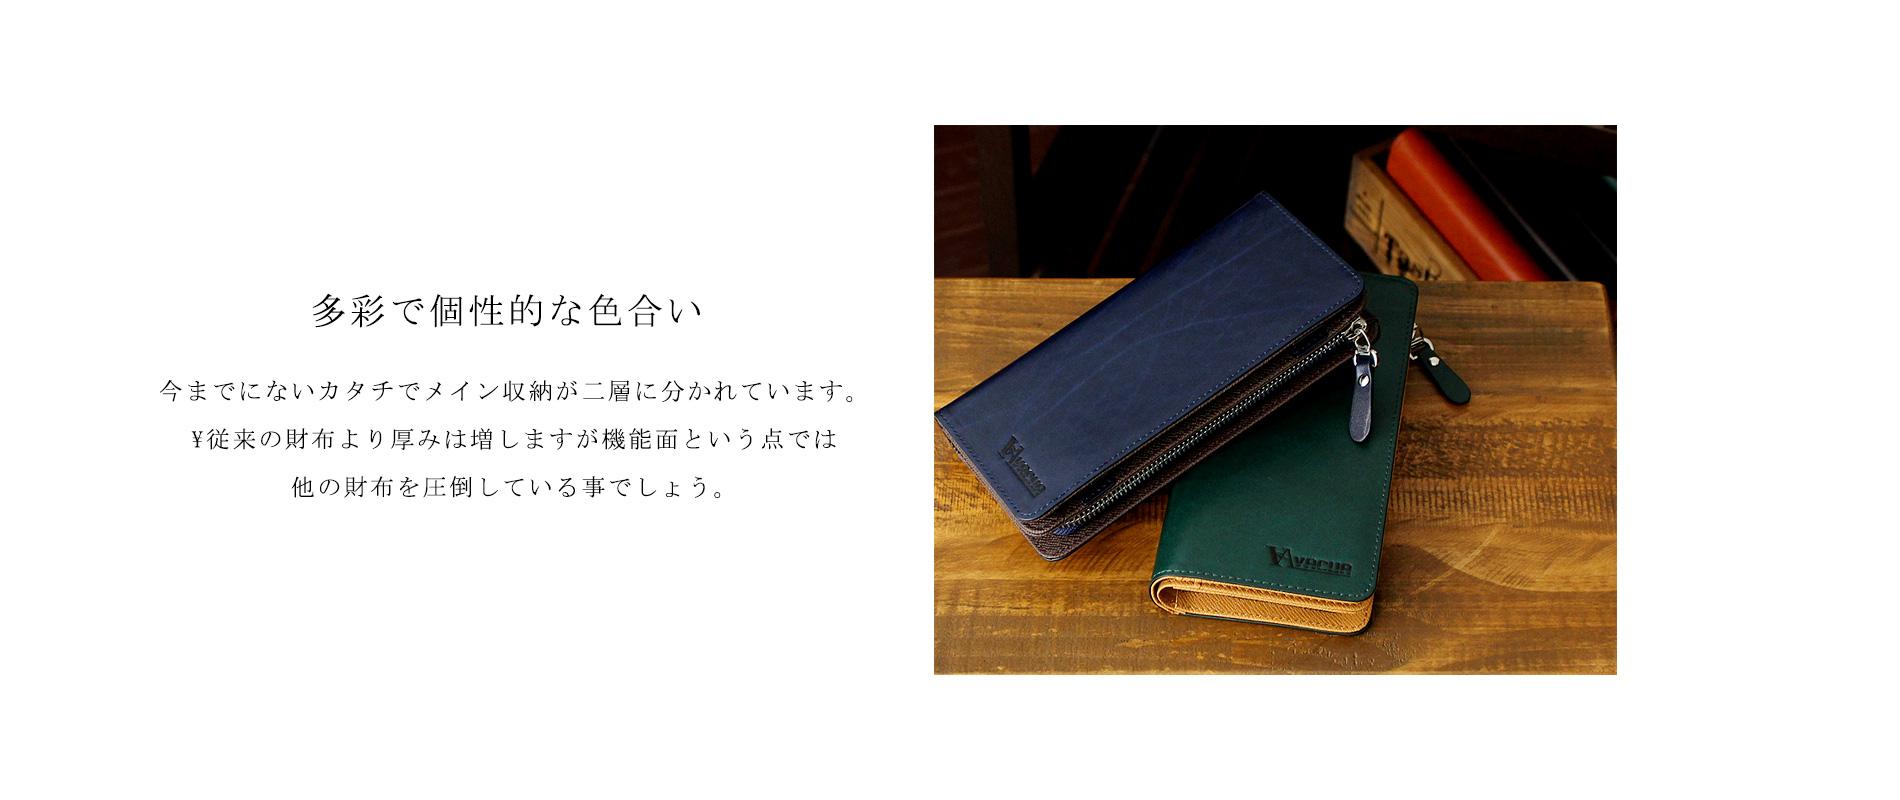 Ĺ���� ��� �쥶�� �� ¿��ǽ L��ե����ʡ�������å� VACUA (11��) ��VA-6619��